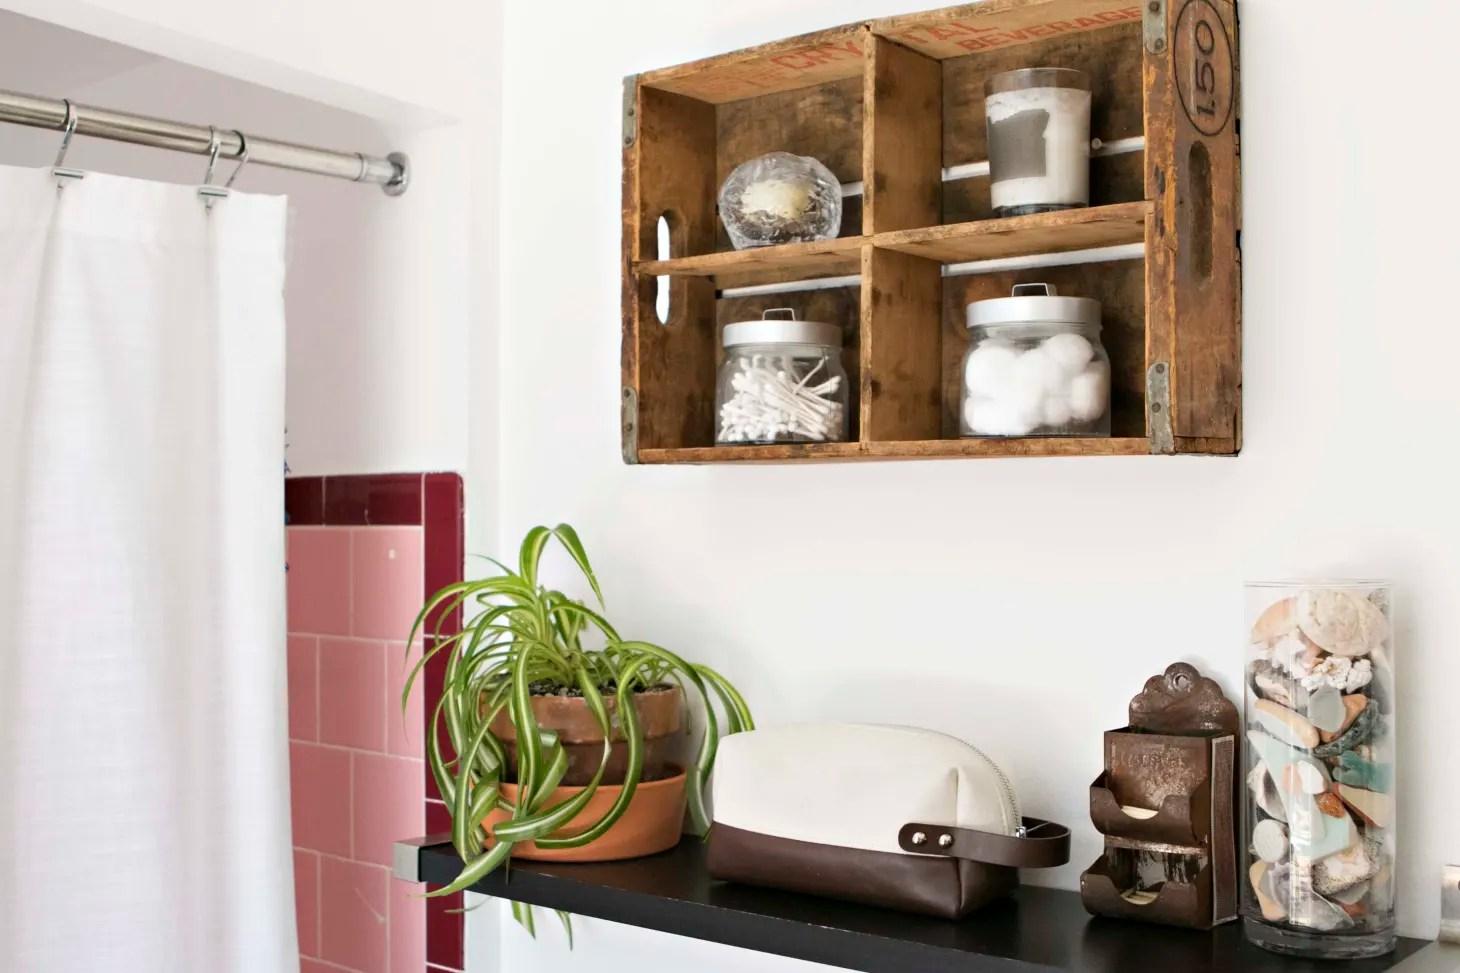 25 Small Bathroom Storage & Design Ideas - Storage ... on Small Apartment Bathroom Storage Ideas  id=25404